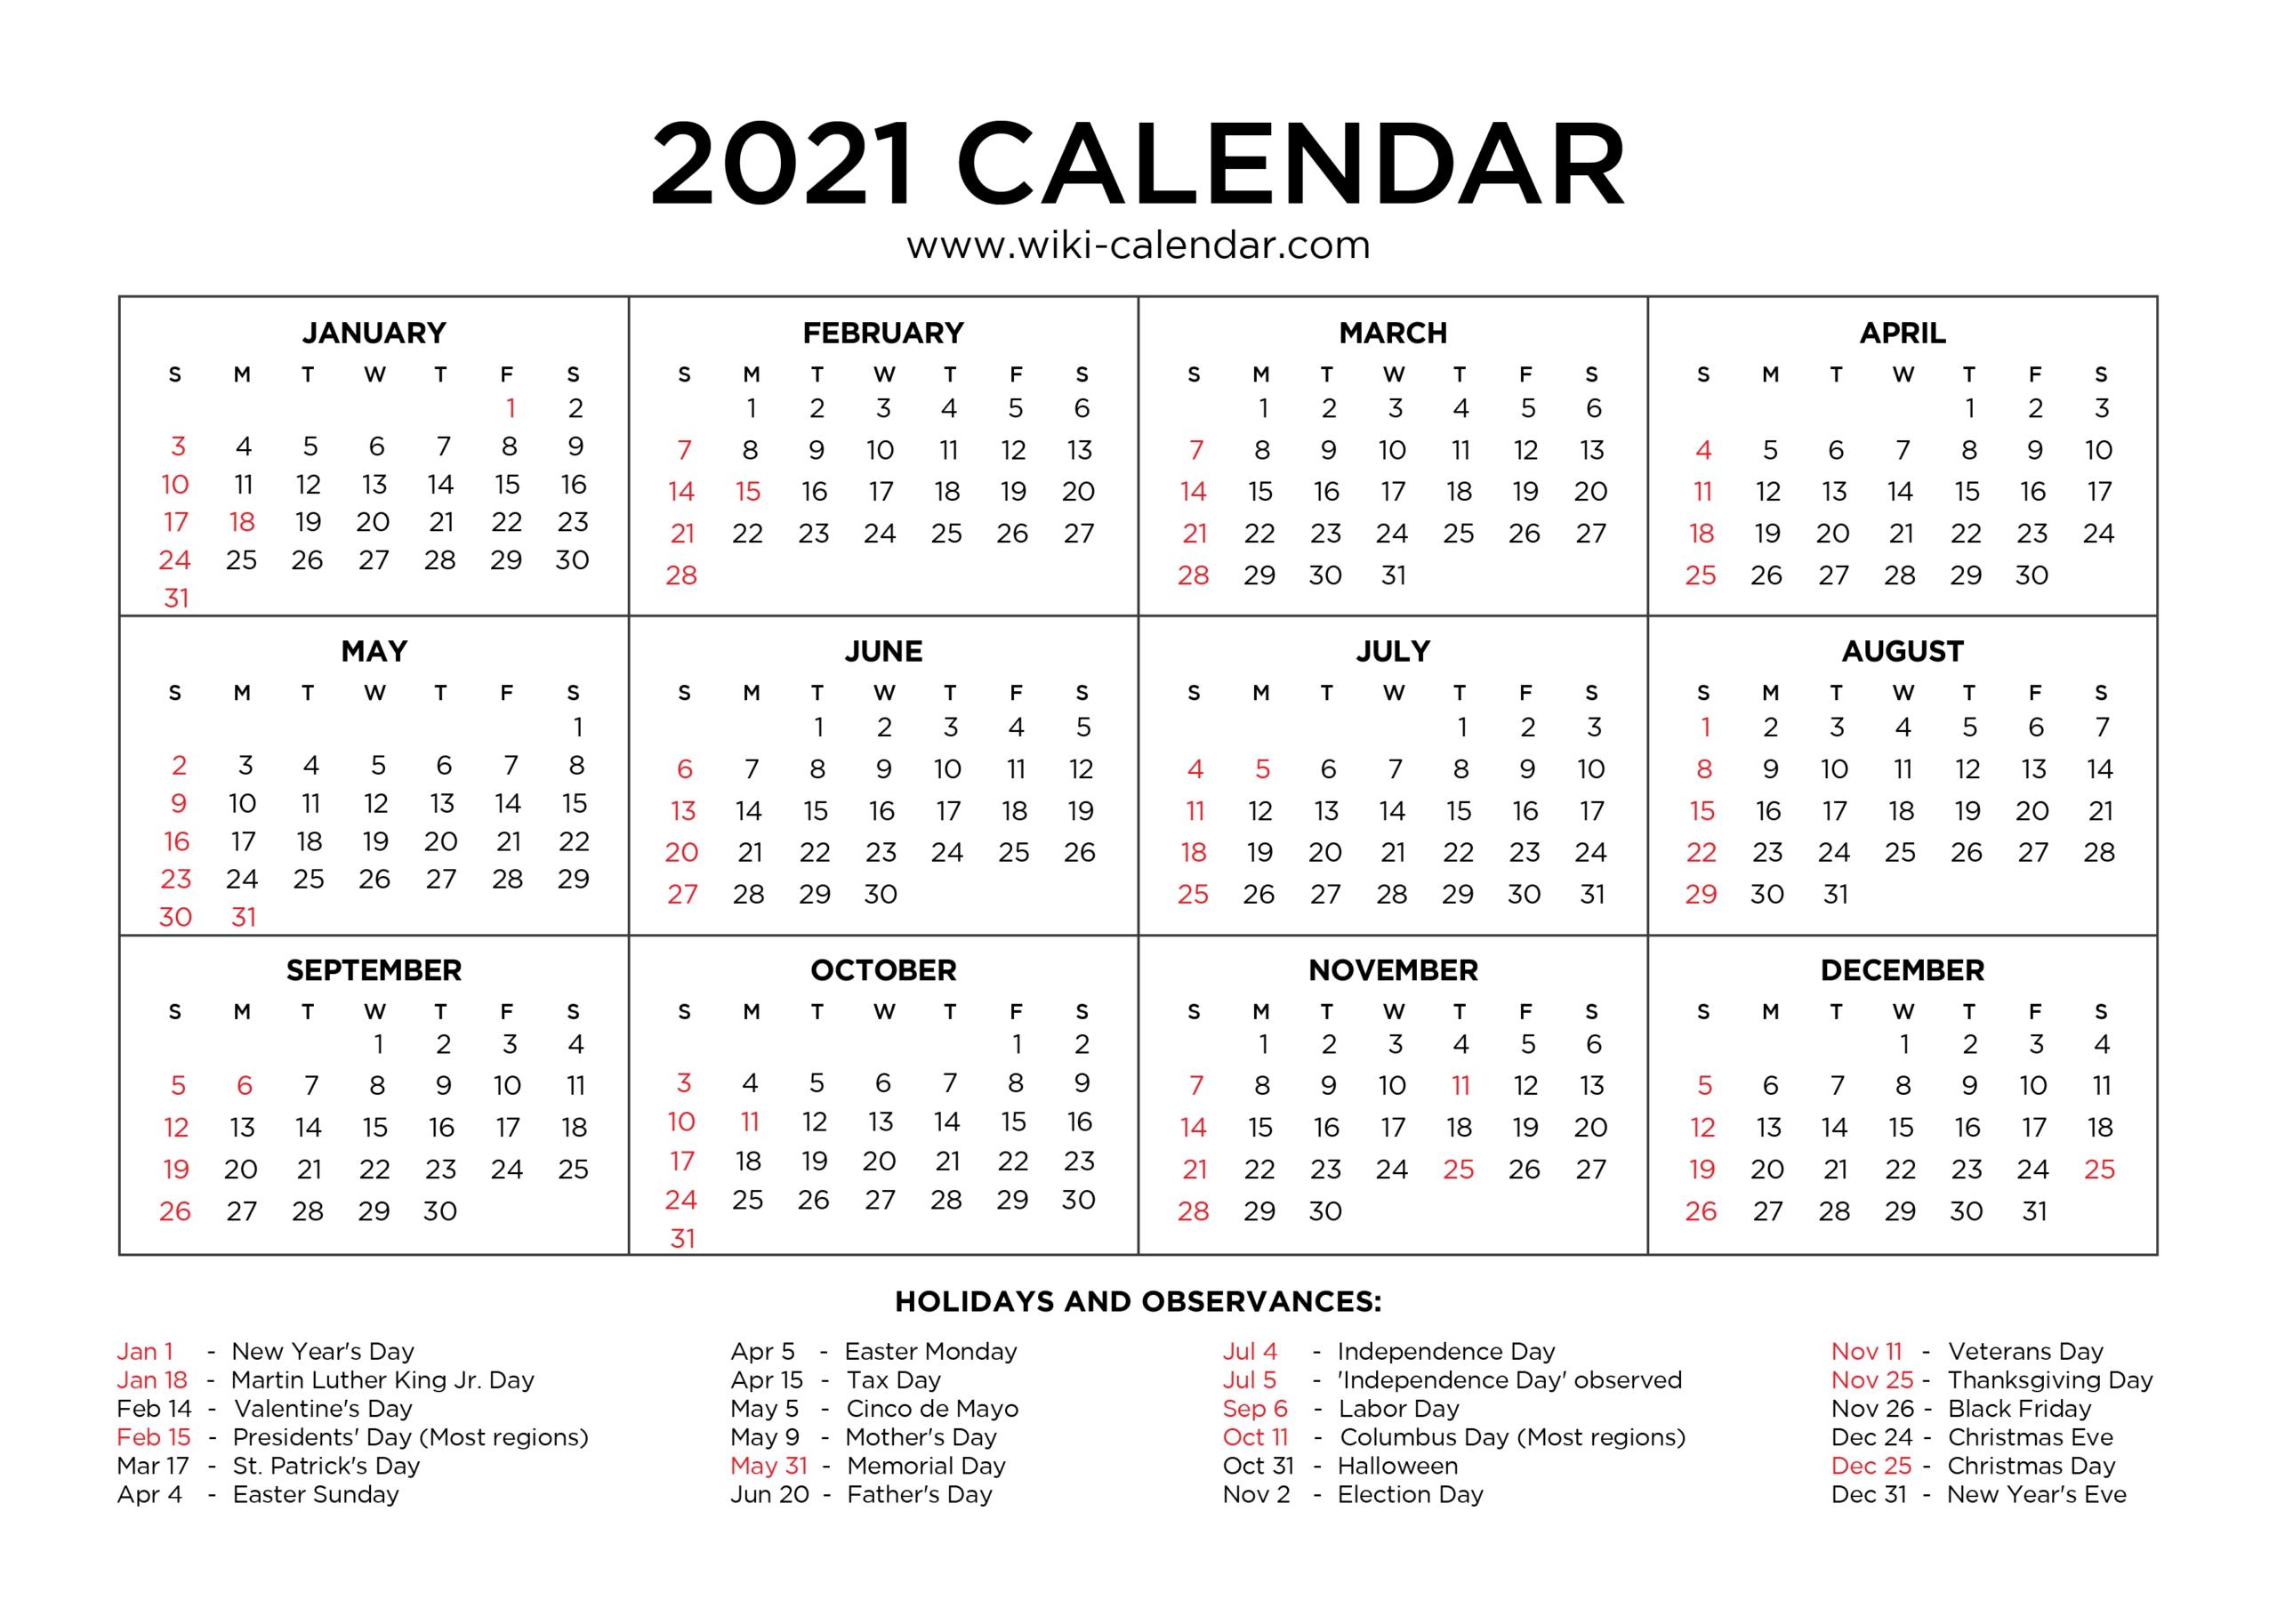 Sunday To Saturday Calendar 2021 Printable | Calendar Printables Free Blank regarding 2021 Free Printable Weekly Calendar Blank Image